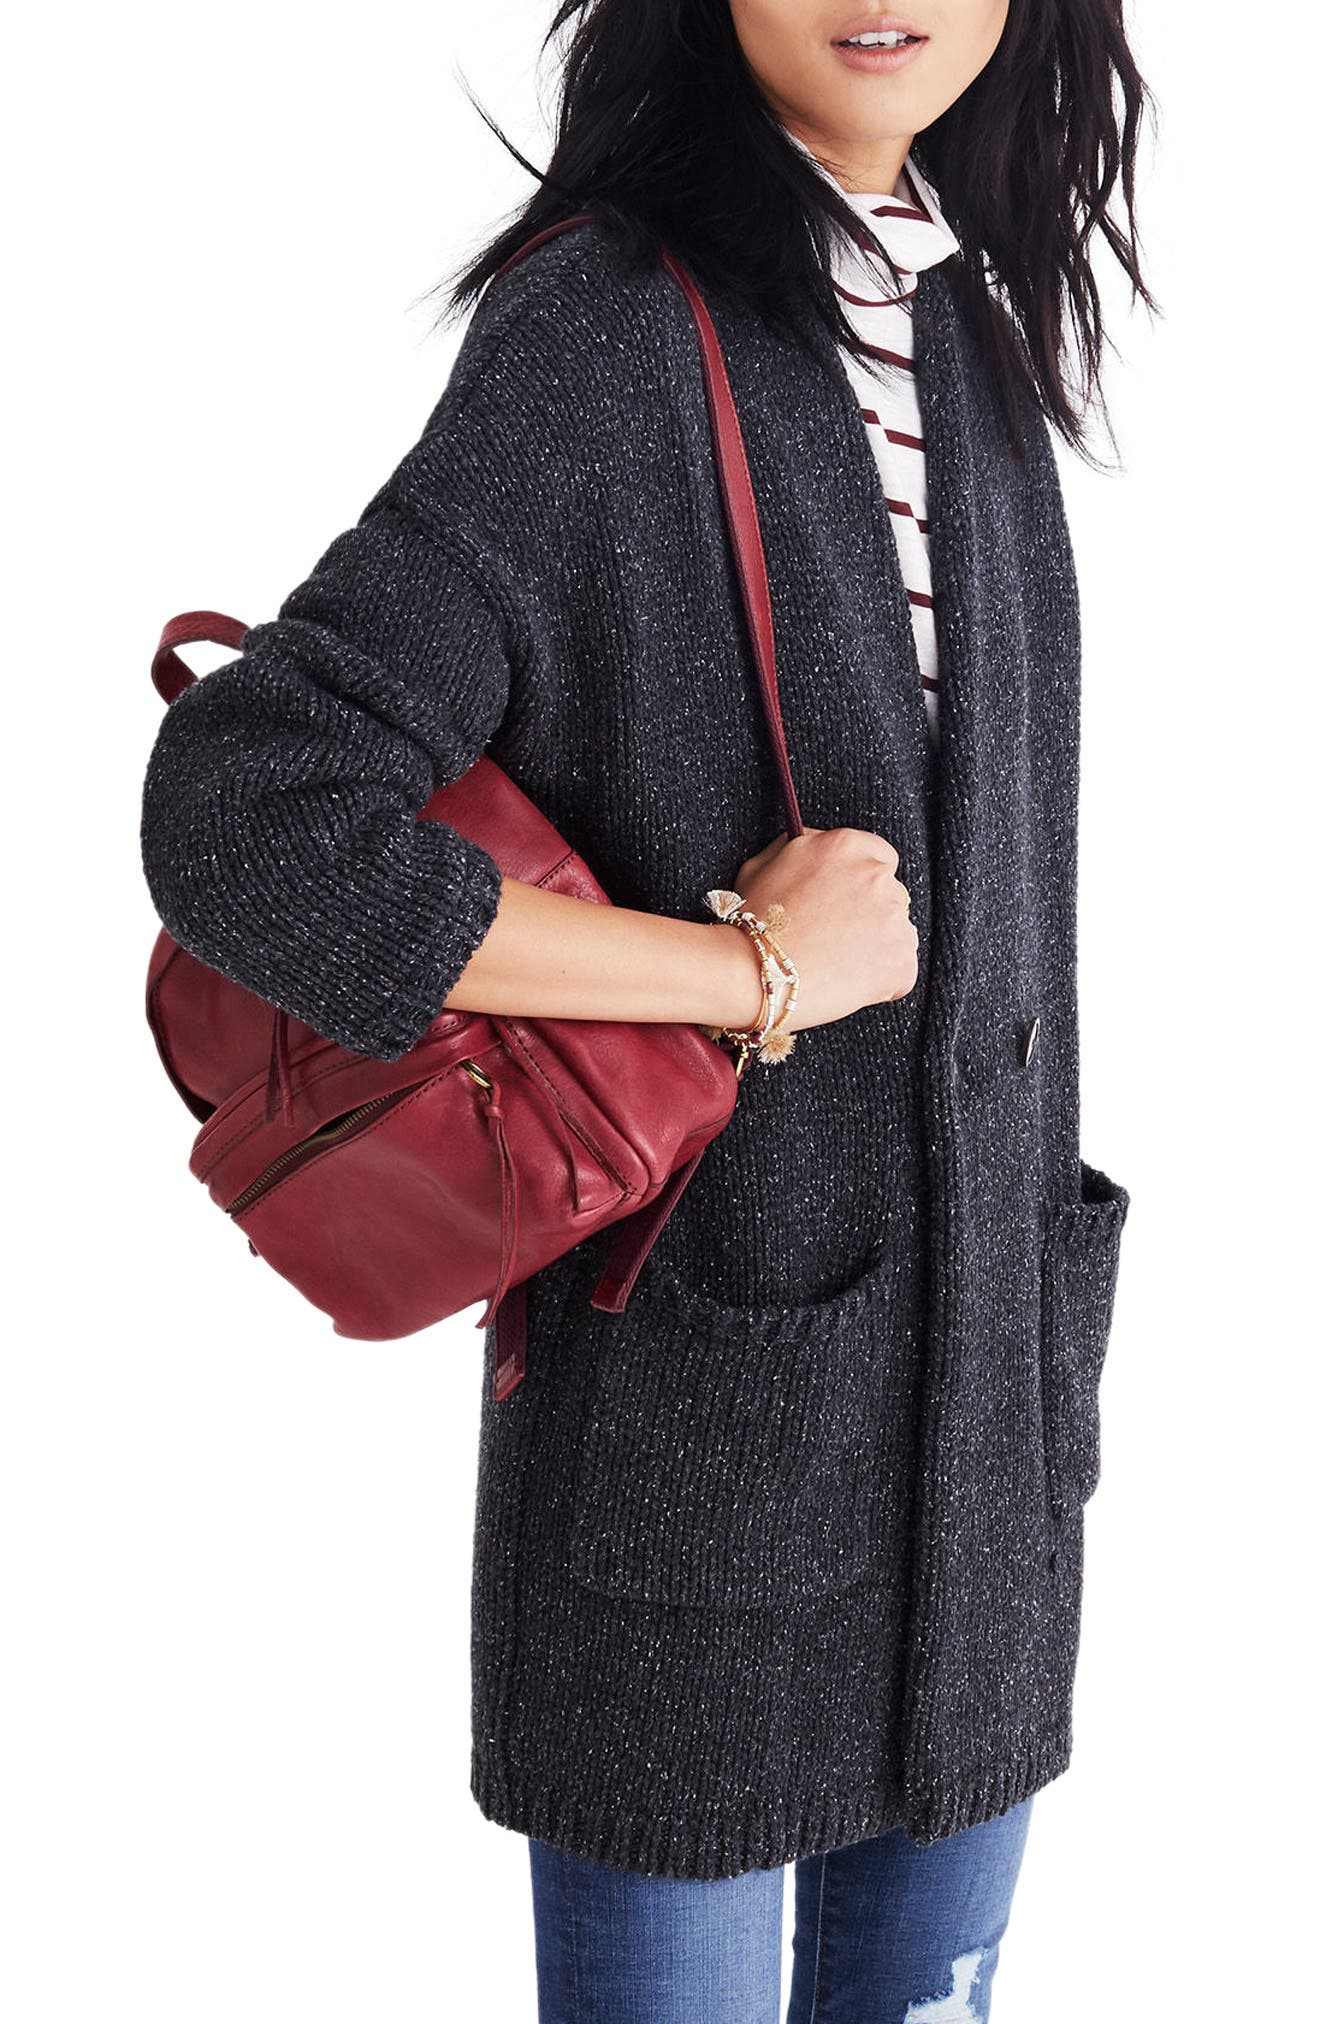 Glenhill Sweater Coat,                         Main,                         color, 001